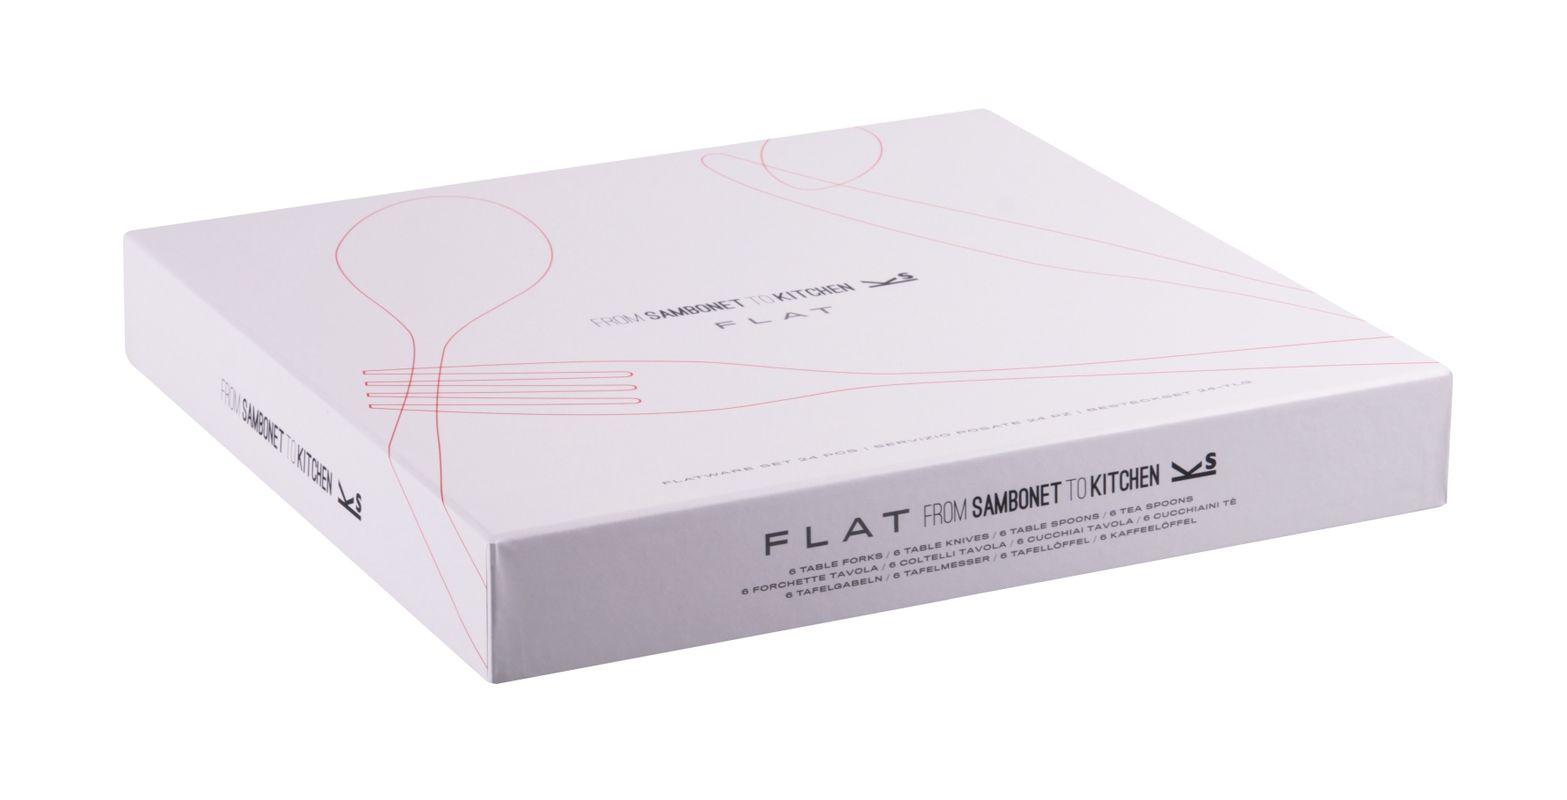 sambonet_bestekset_flat_verpakking.jpg